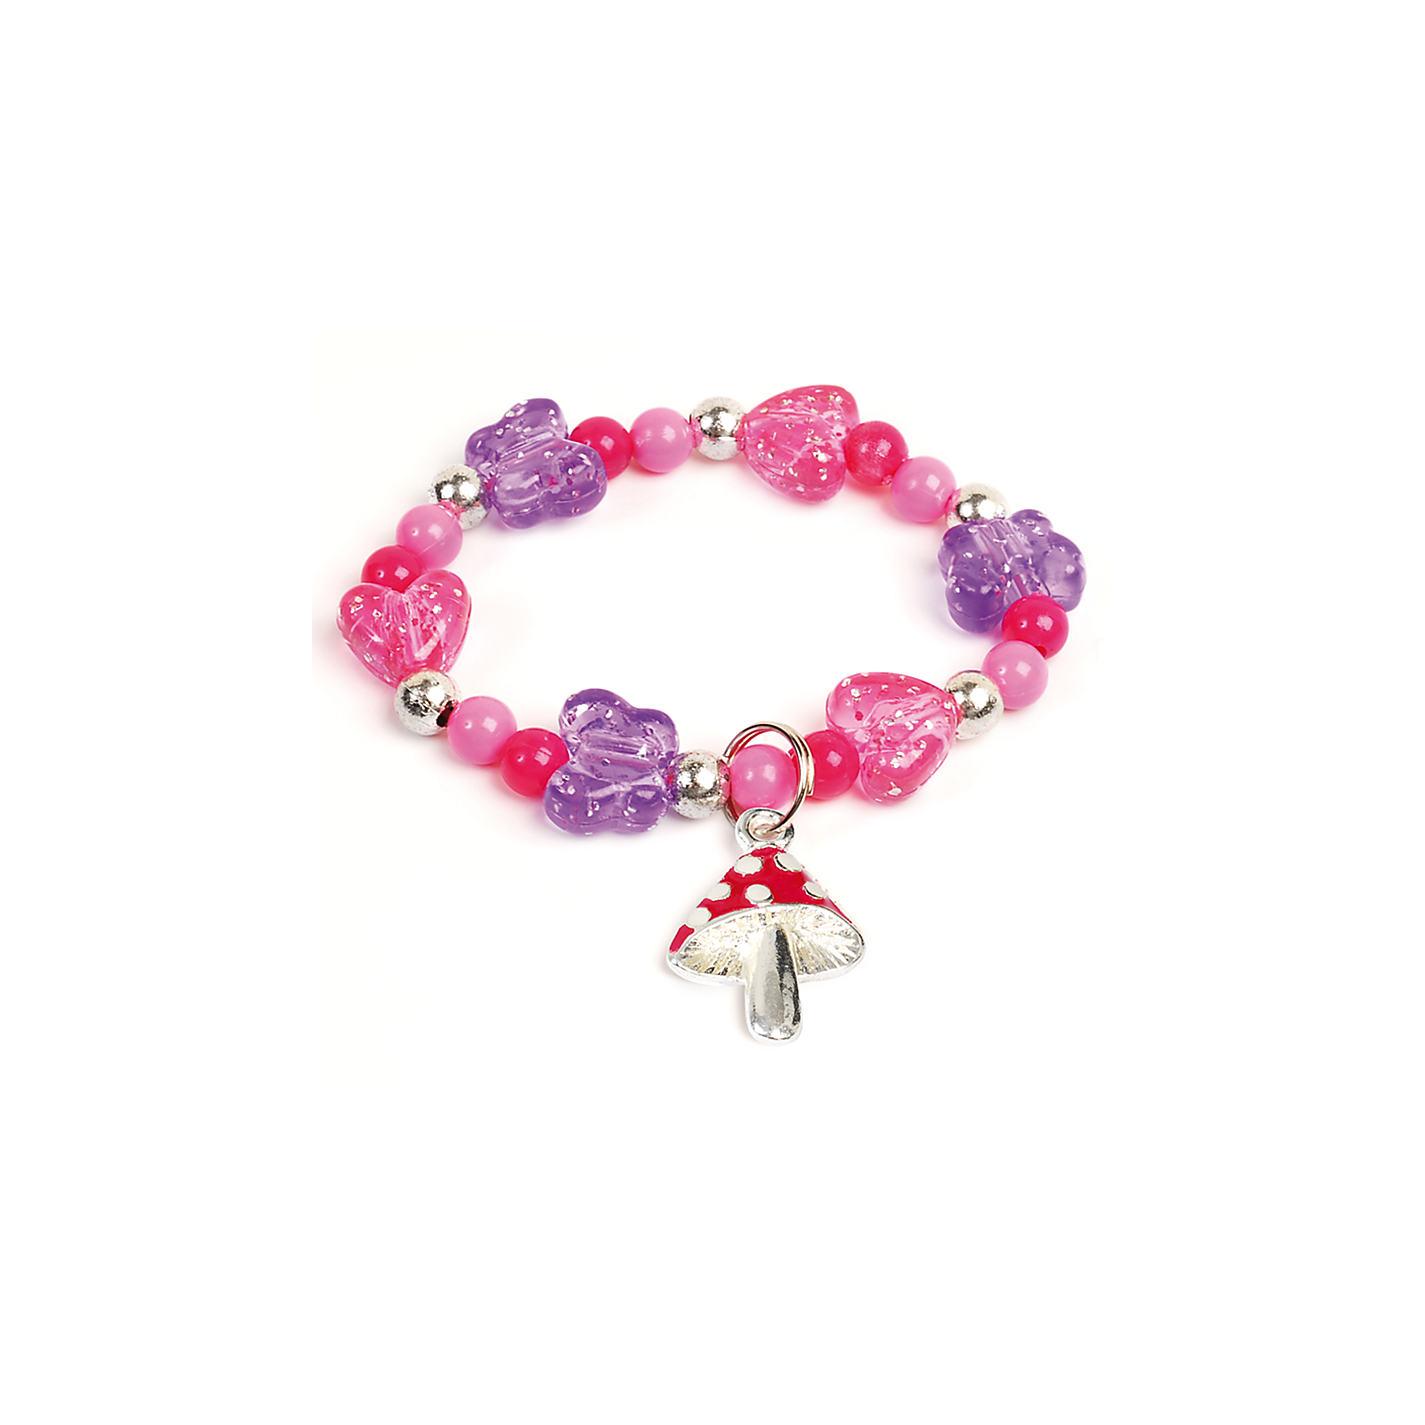 Fairy Charm Jewellery Own Fairy Charm Jewellery